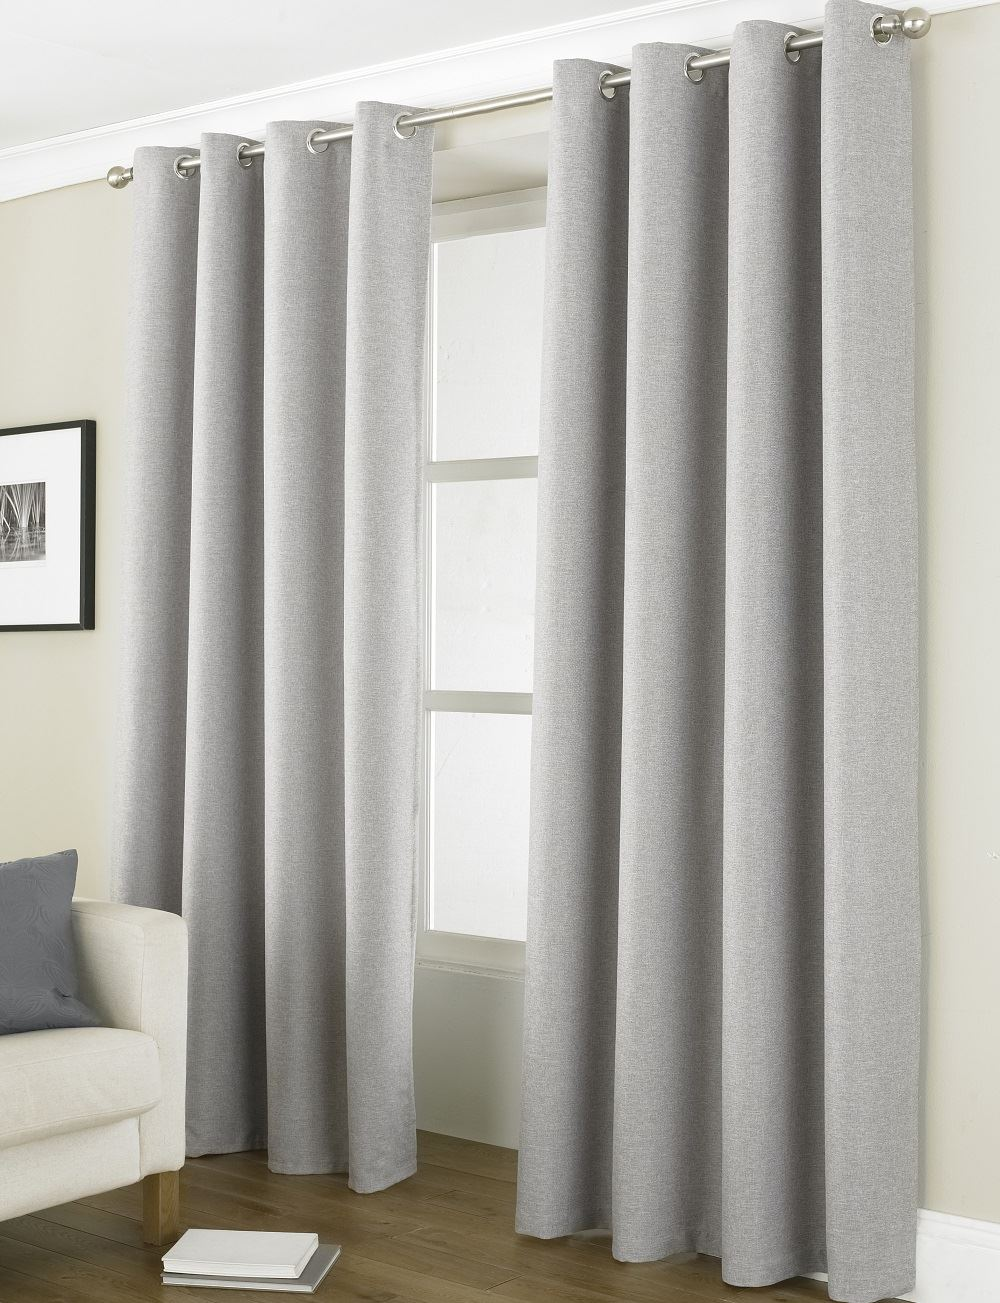 Linea Luxury 72 90 Long Blackout Energy Saver Ring Top Eyelet Curtain Pairs Ebay